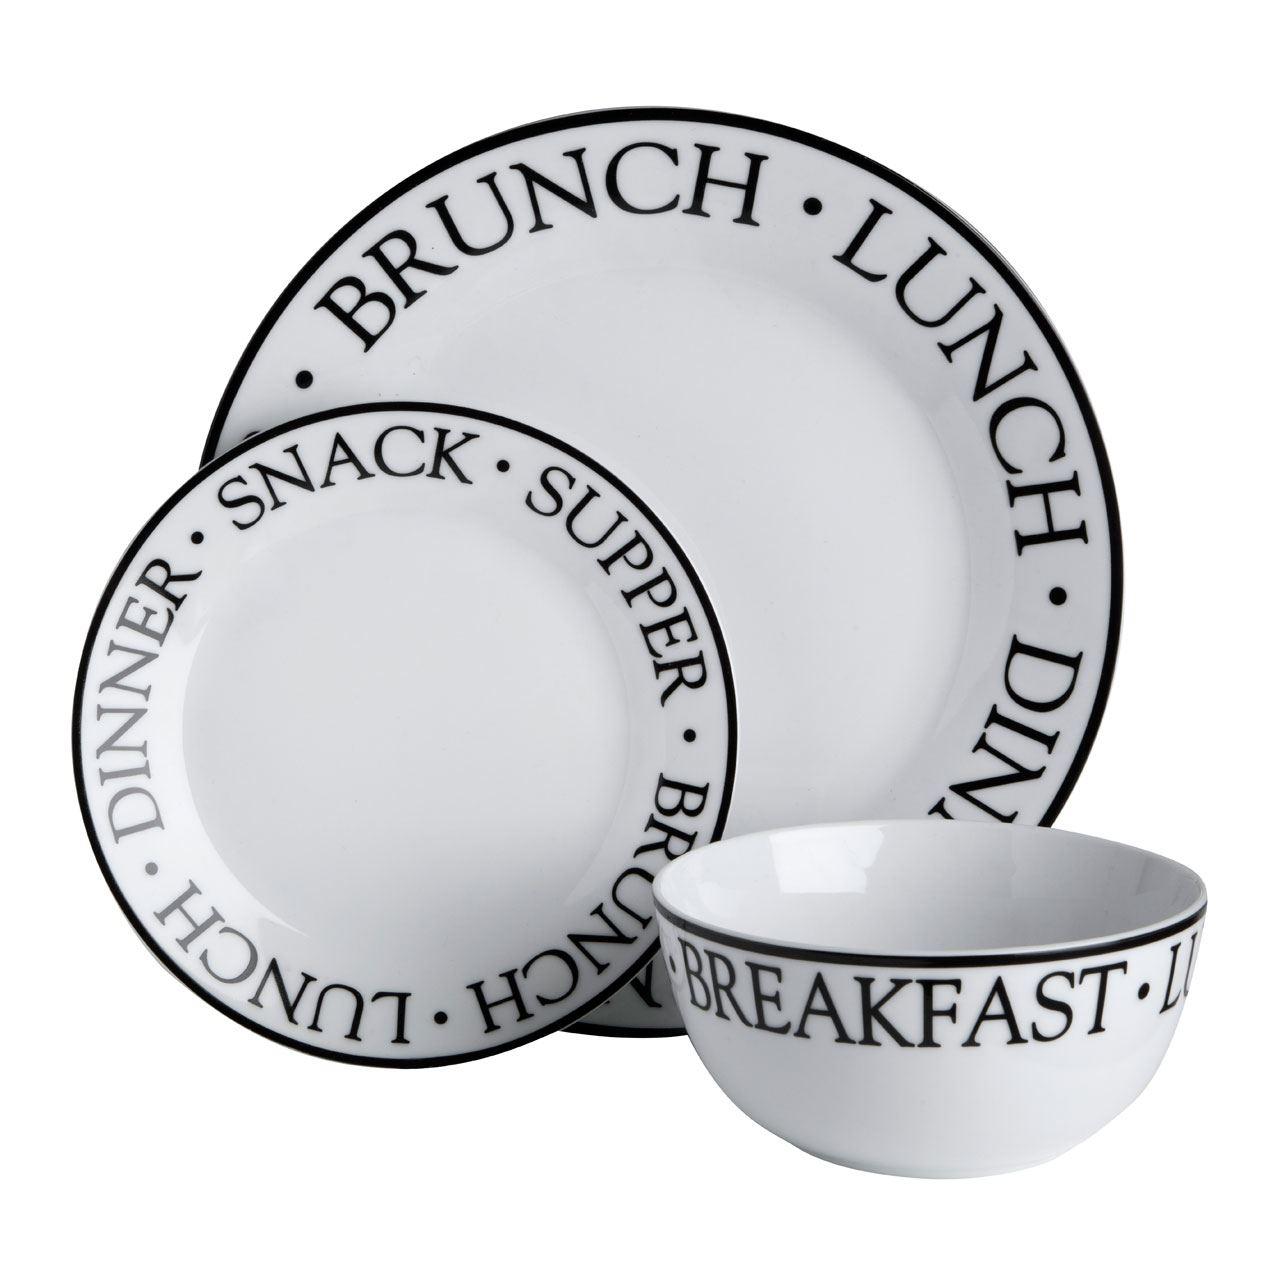 12pc-Porcelain-Dinner-Set-Dining-Tableware-Dinner-Side-  sc 1 st  eBay & 12pc Porcelain Dinner Set (Dining Tableware Dinner/Side Plates ...